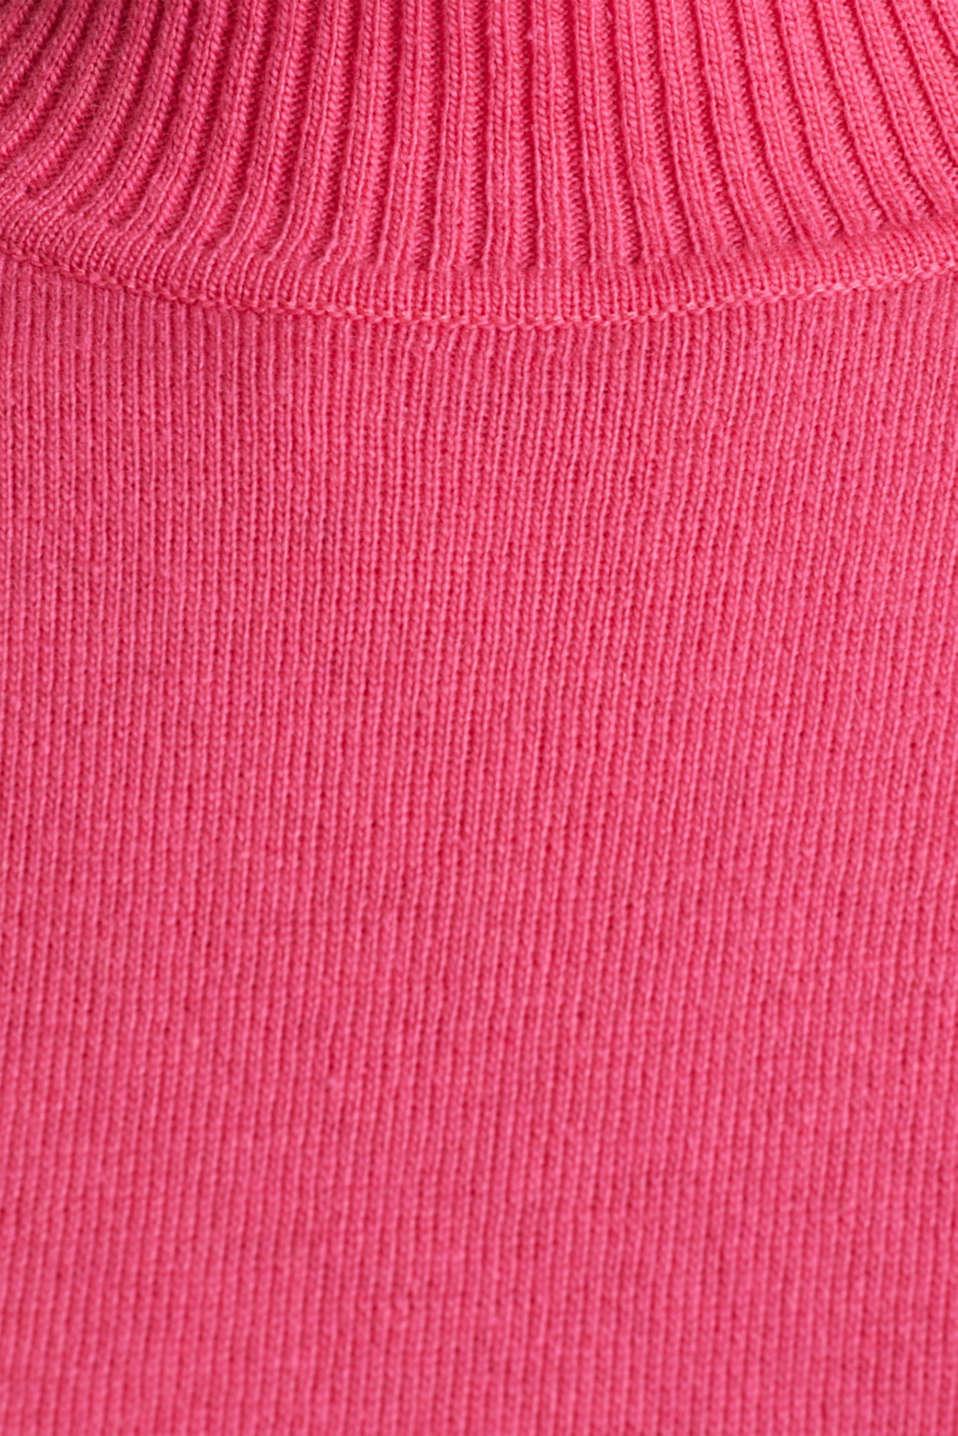 Short sleeve jumper with cashmere, PINK, detail image number 4